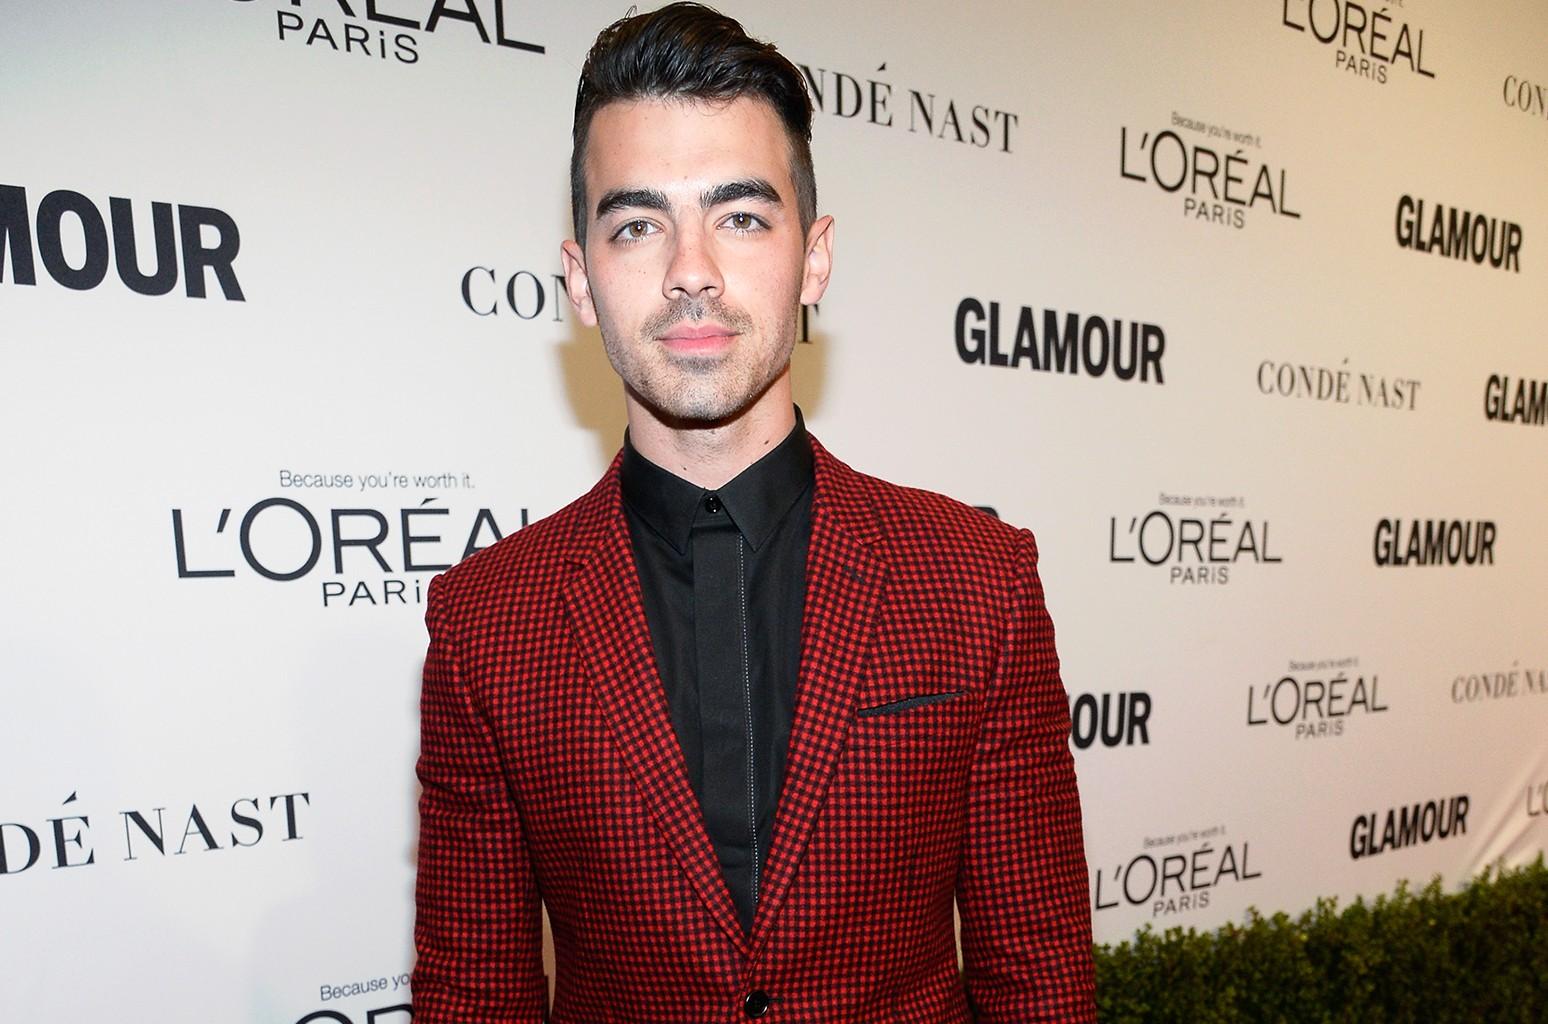 Joe Jonas at NeueHouse Hollywood on Nov. 14, 2016 in Los Angeles.